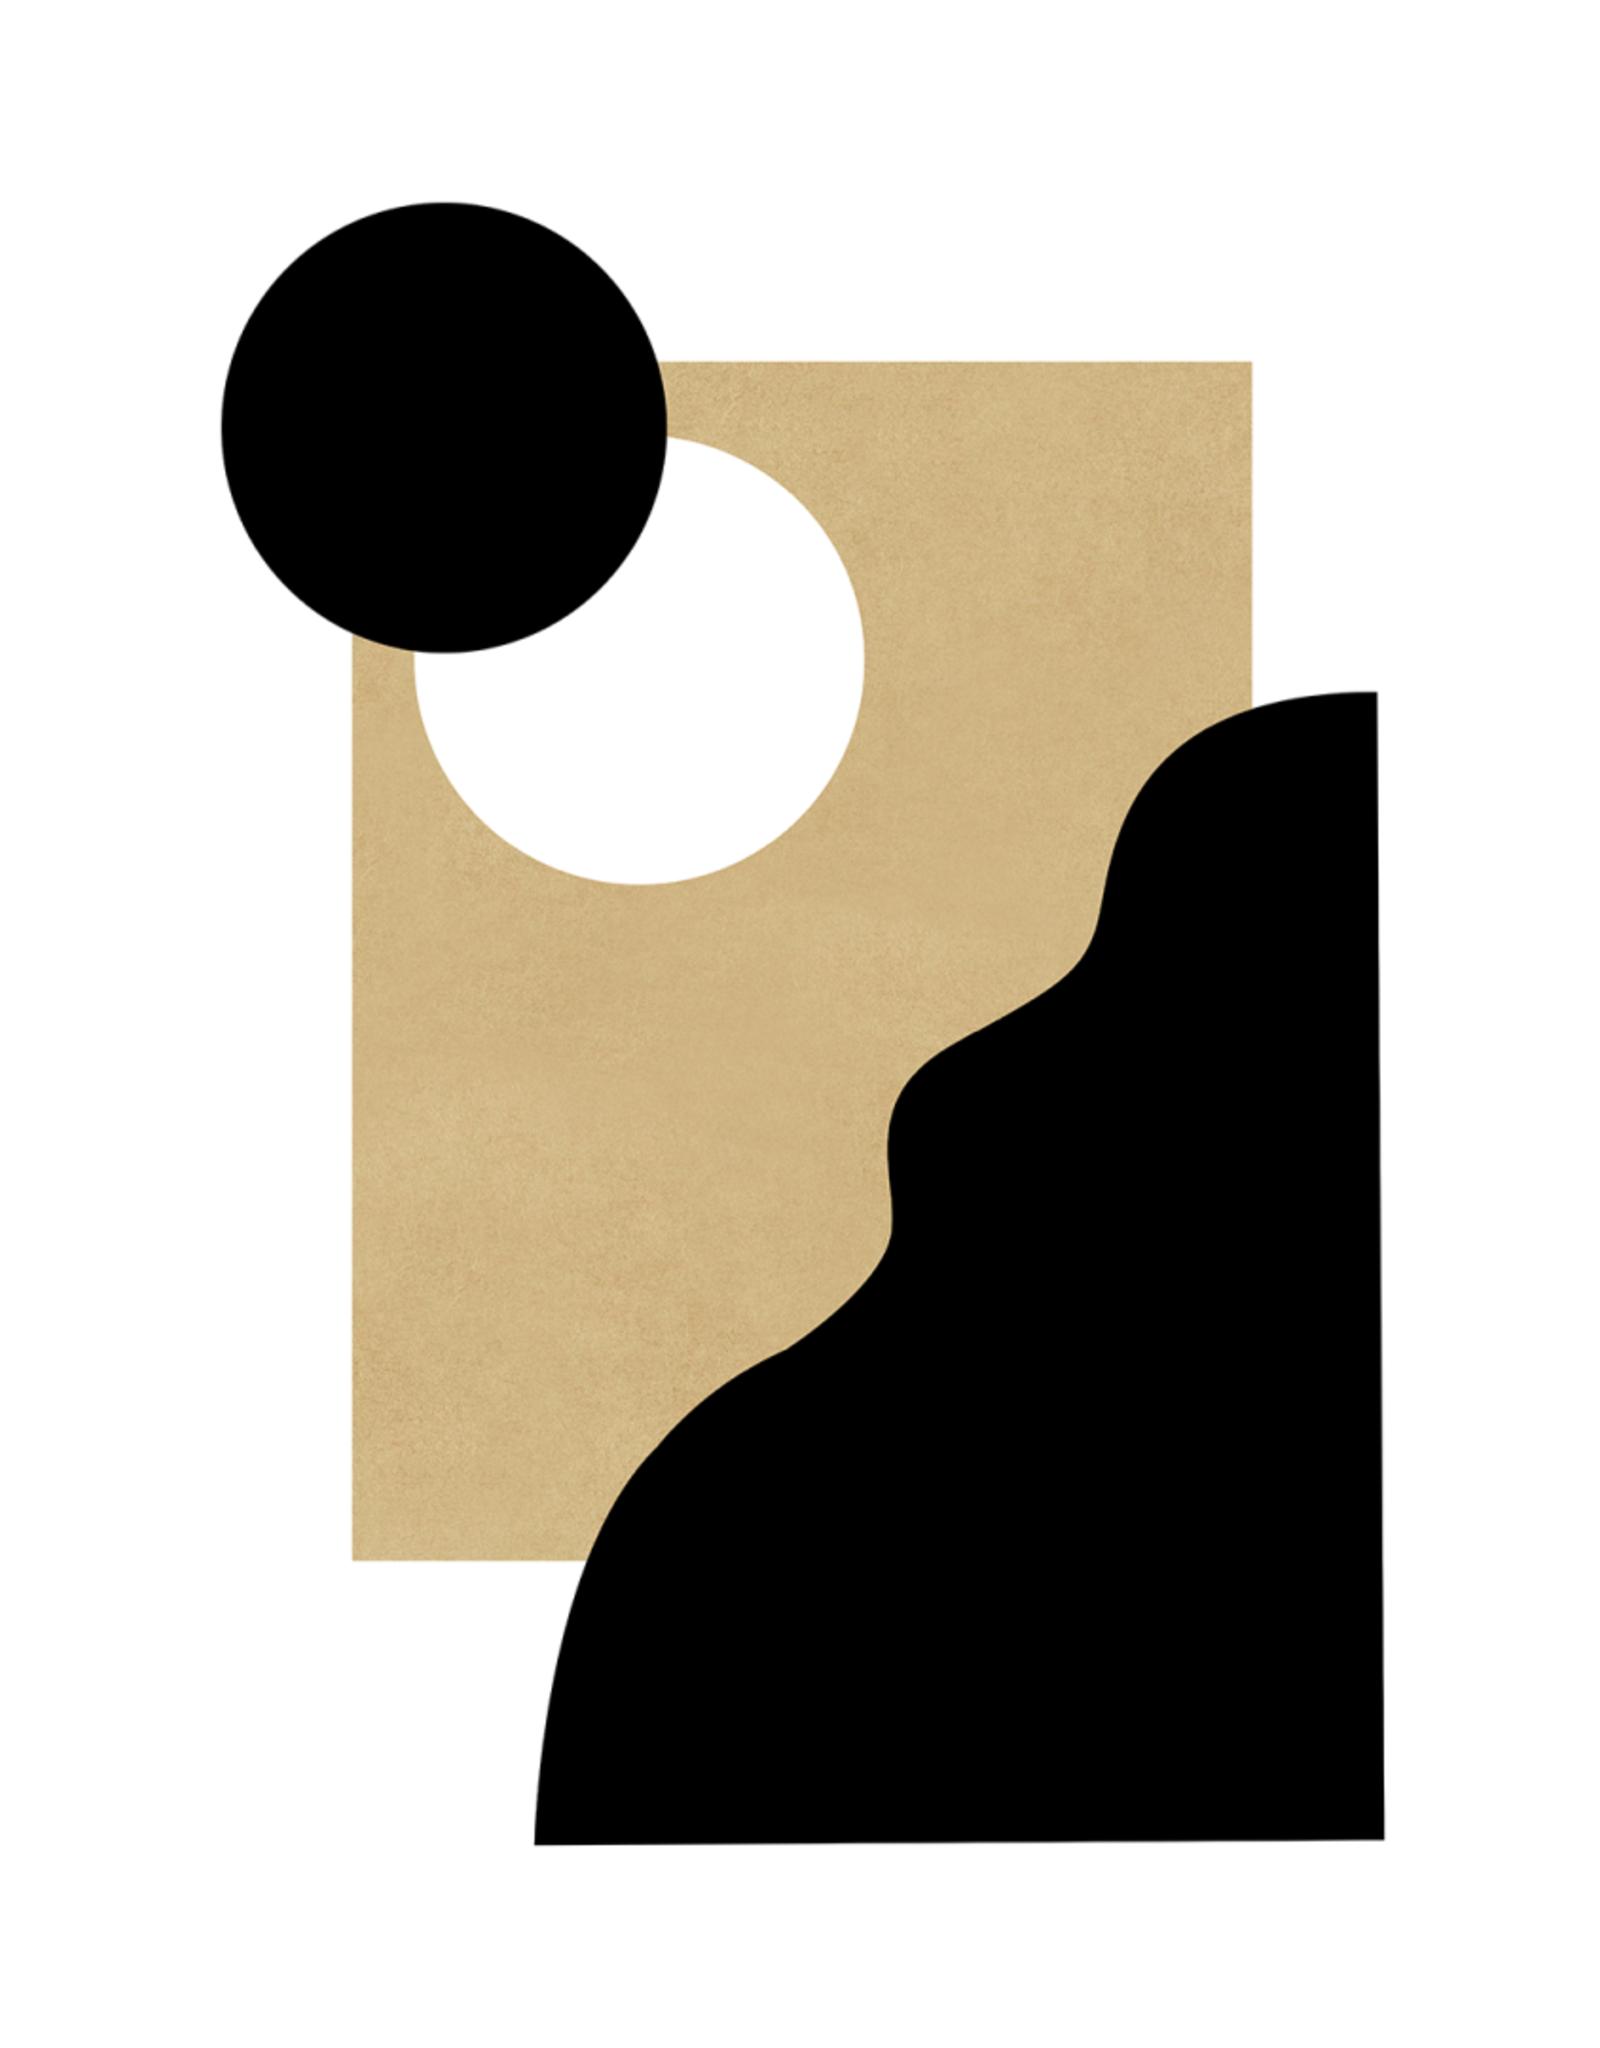 Paper Collective 'Libre' by Denis Boudart